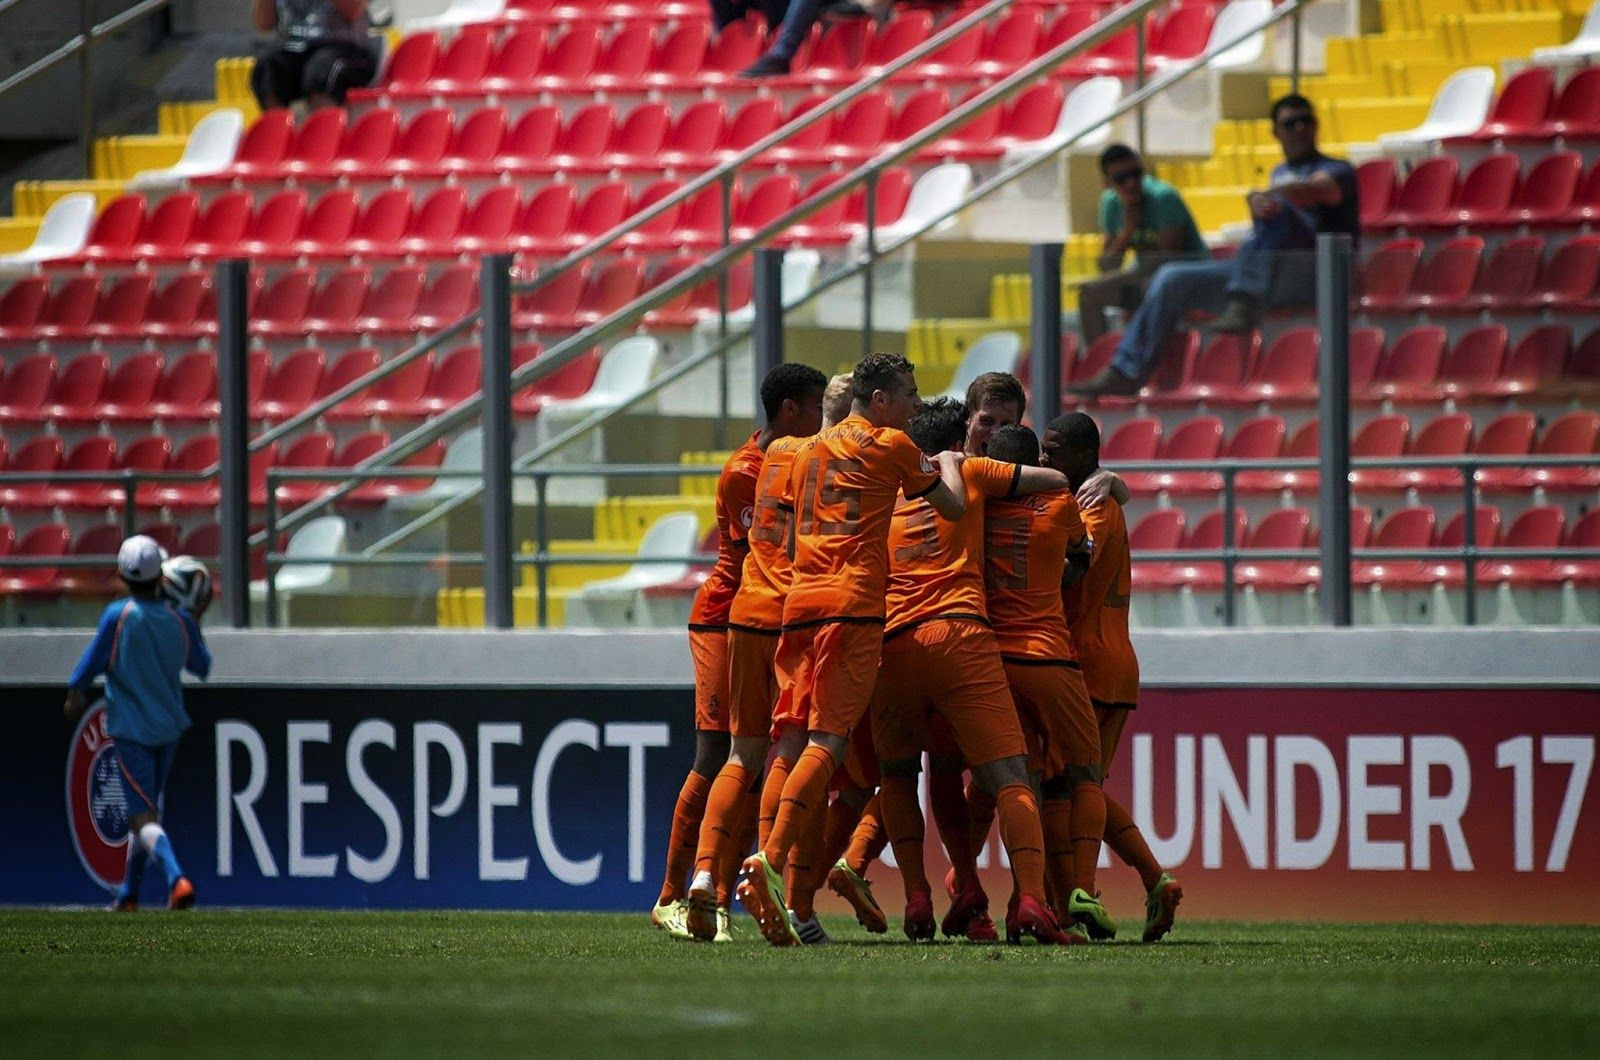 Futbolli Hollandez: Kampionati Europian Under 17: Hollanda - Skocia 5-...